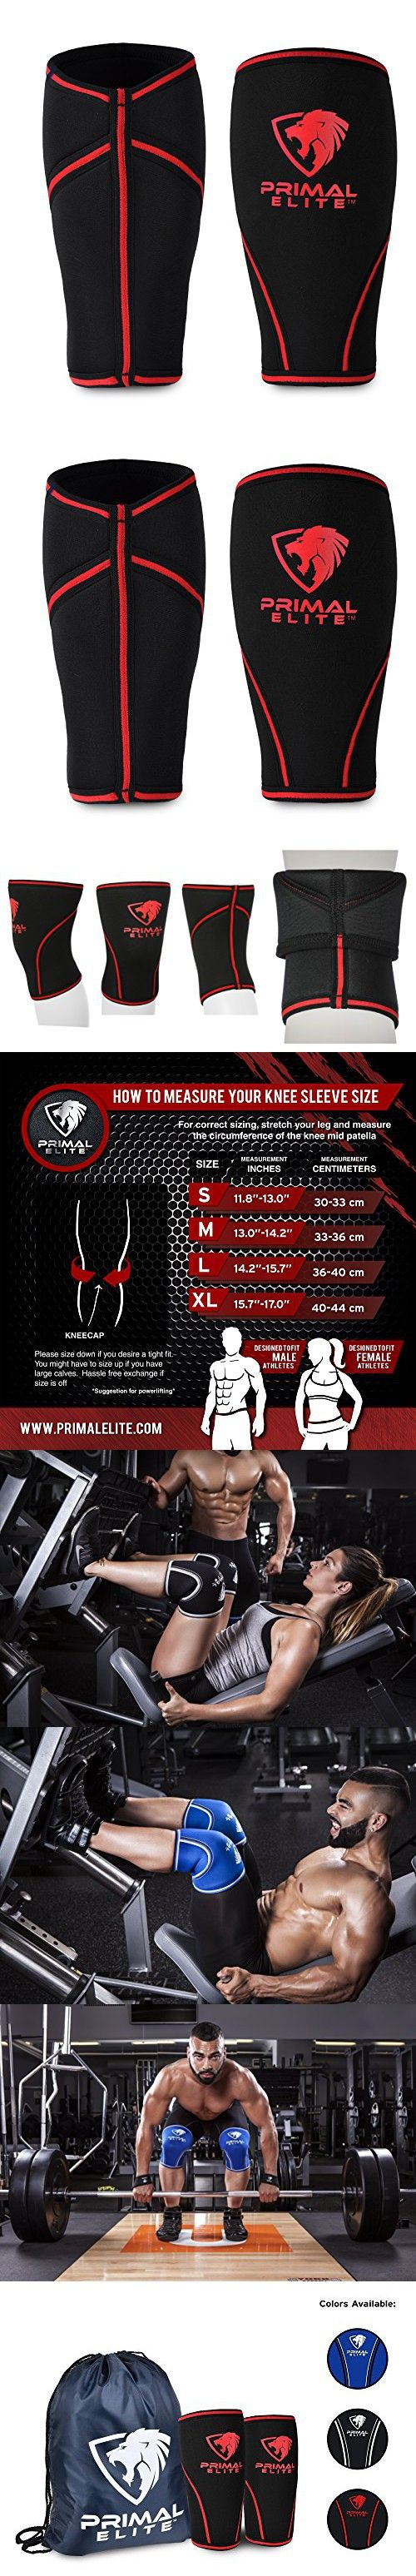 Knee Sleeves ( 1 Pair w/ bag ) Best Orthopedic Knee Support & Pain Compression Brace for Squats, Crossfit WOD, Weightlifting, Powerlifting - Primal Elite 7mm Strong Knee Sleeves - For Men & Women